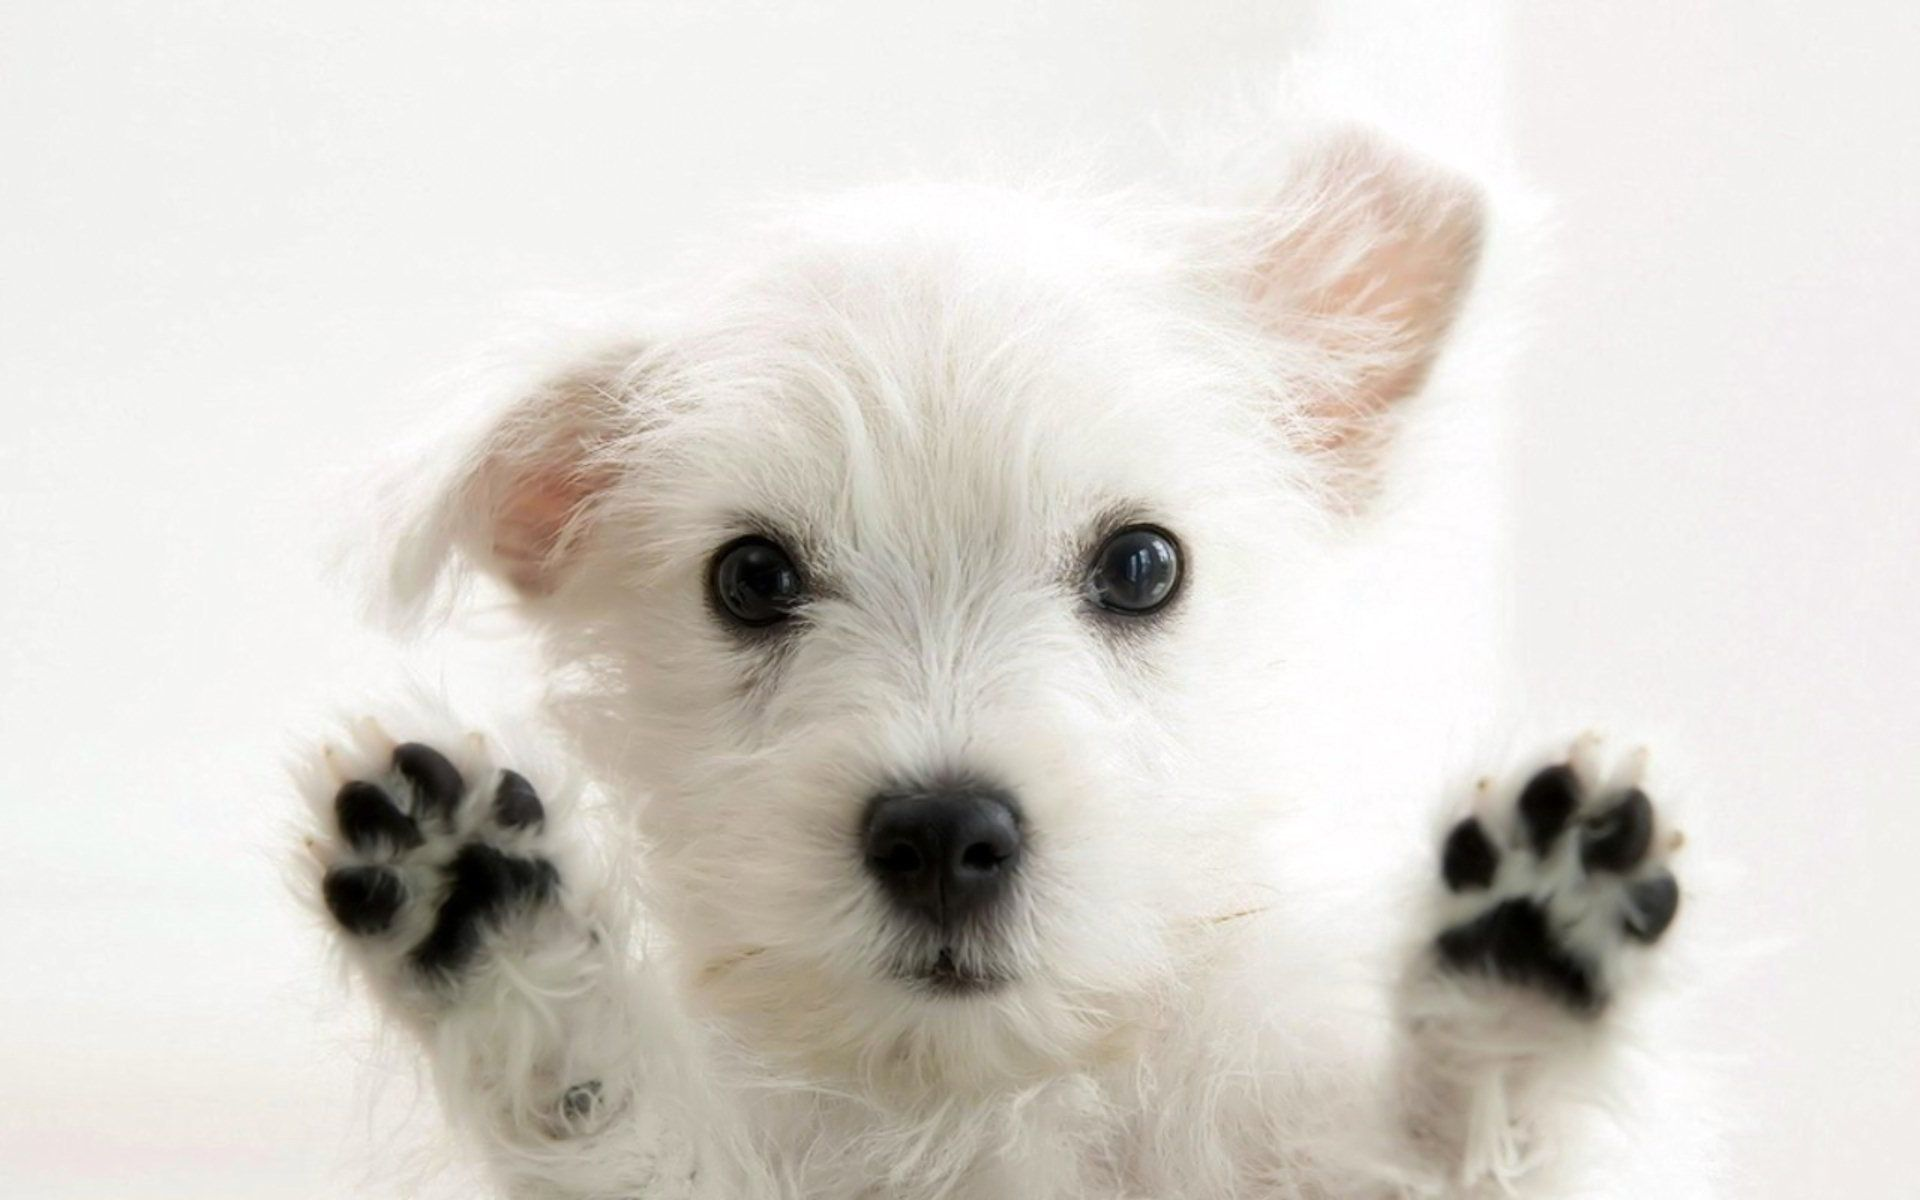 pitbull dog wallpapers live pitbull dog backgrounds pc | hd